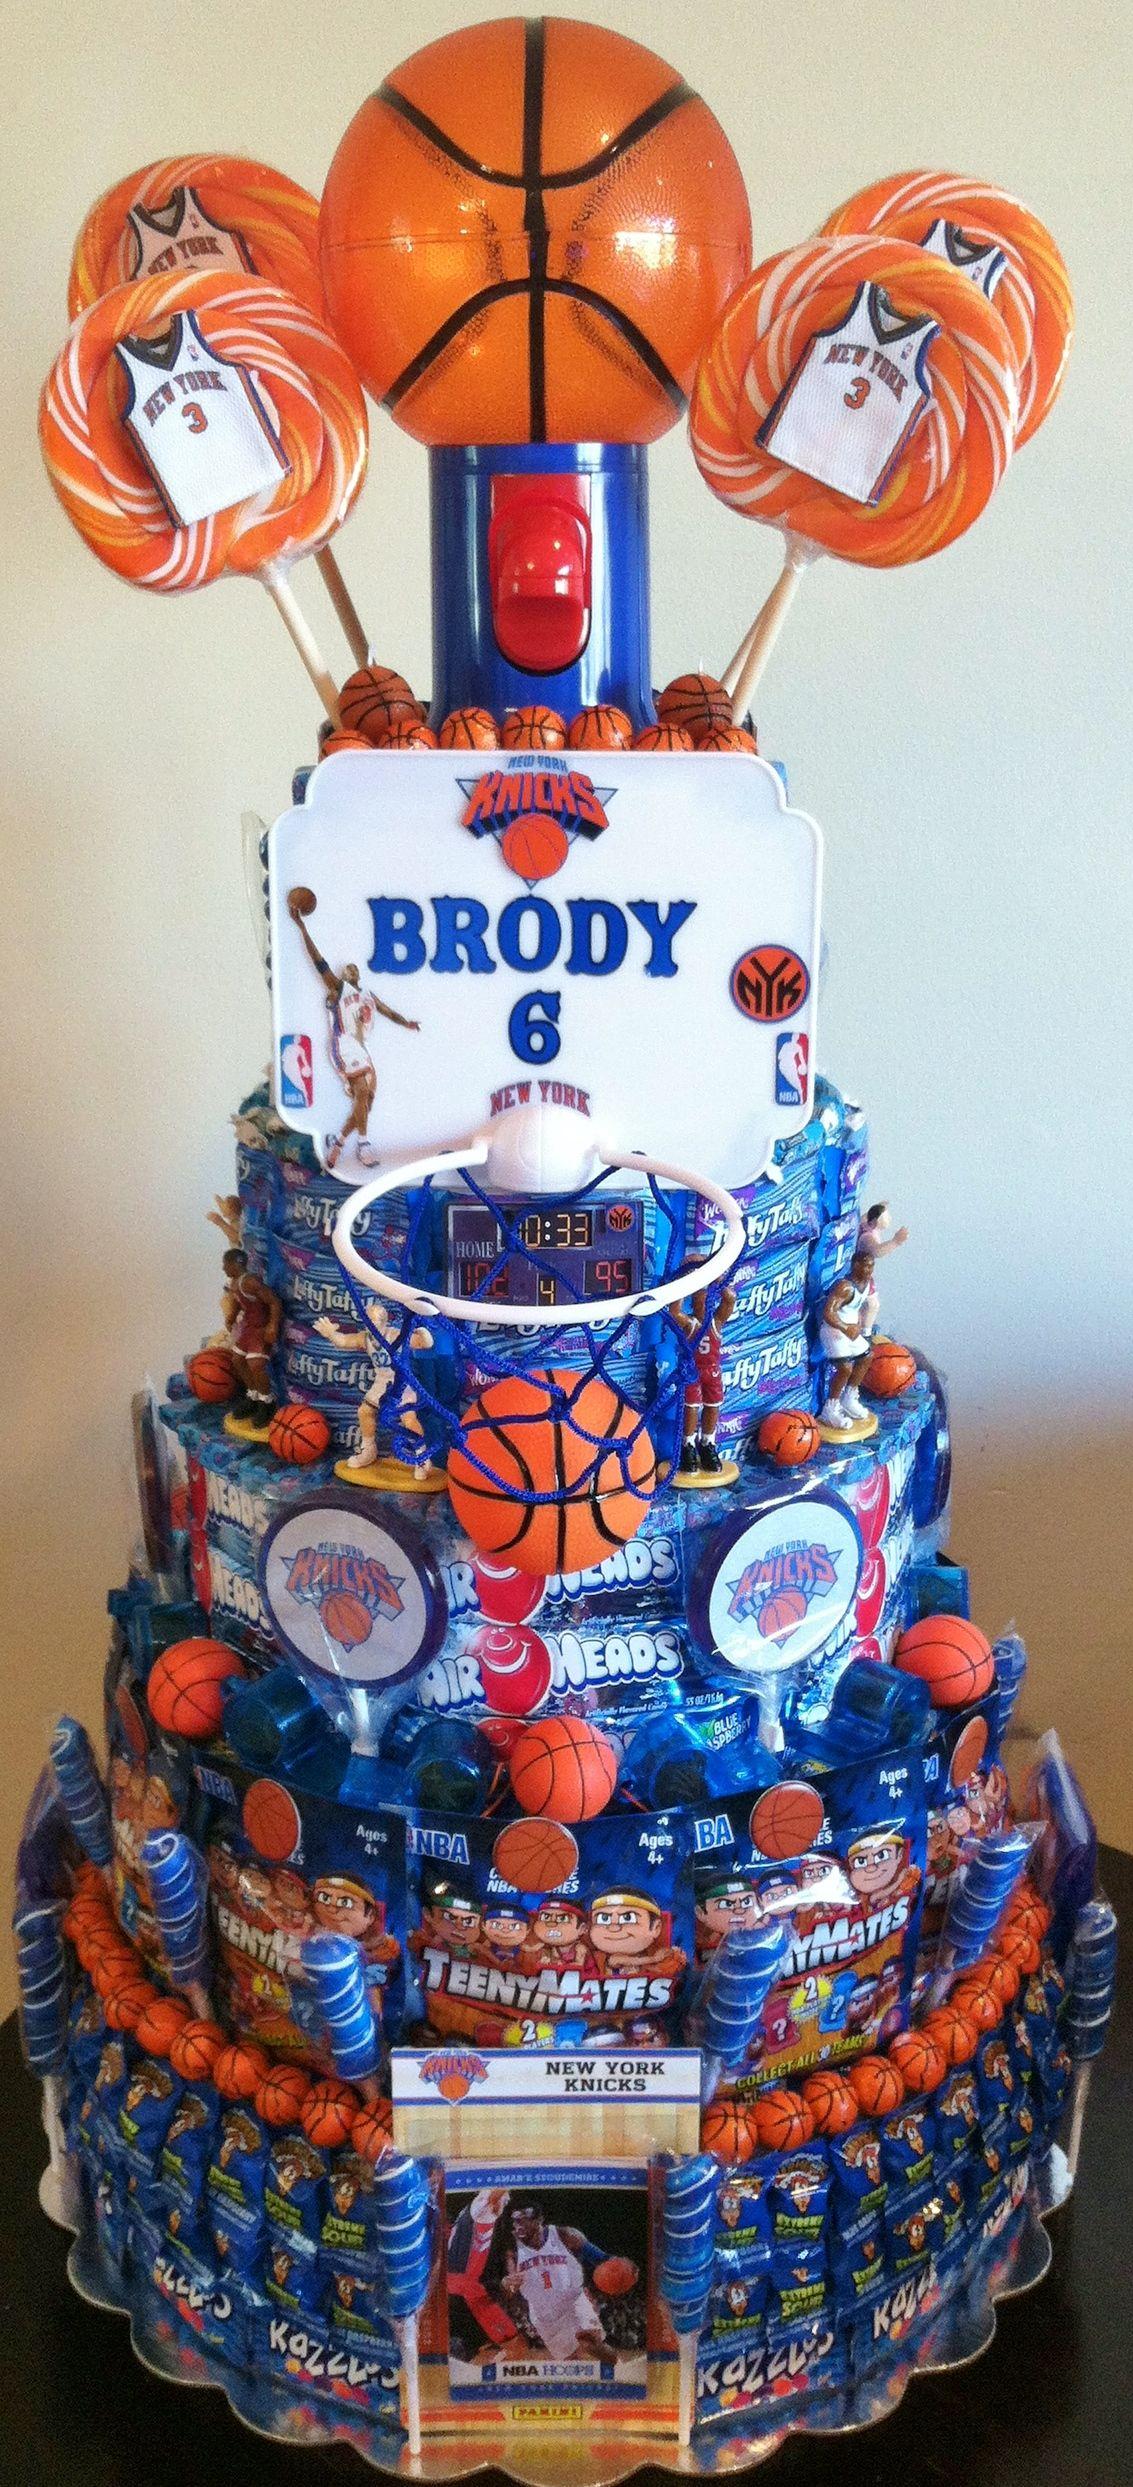 basketball party knicks team basketball theme cake candy